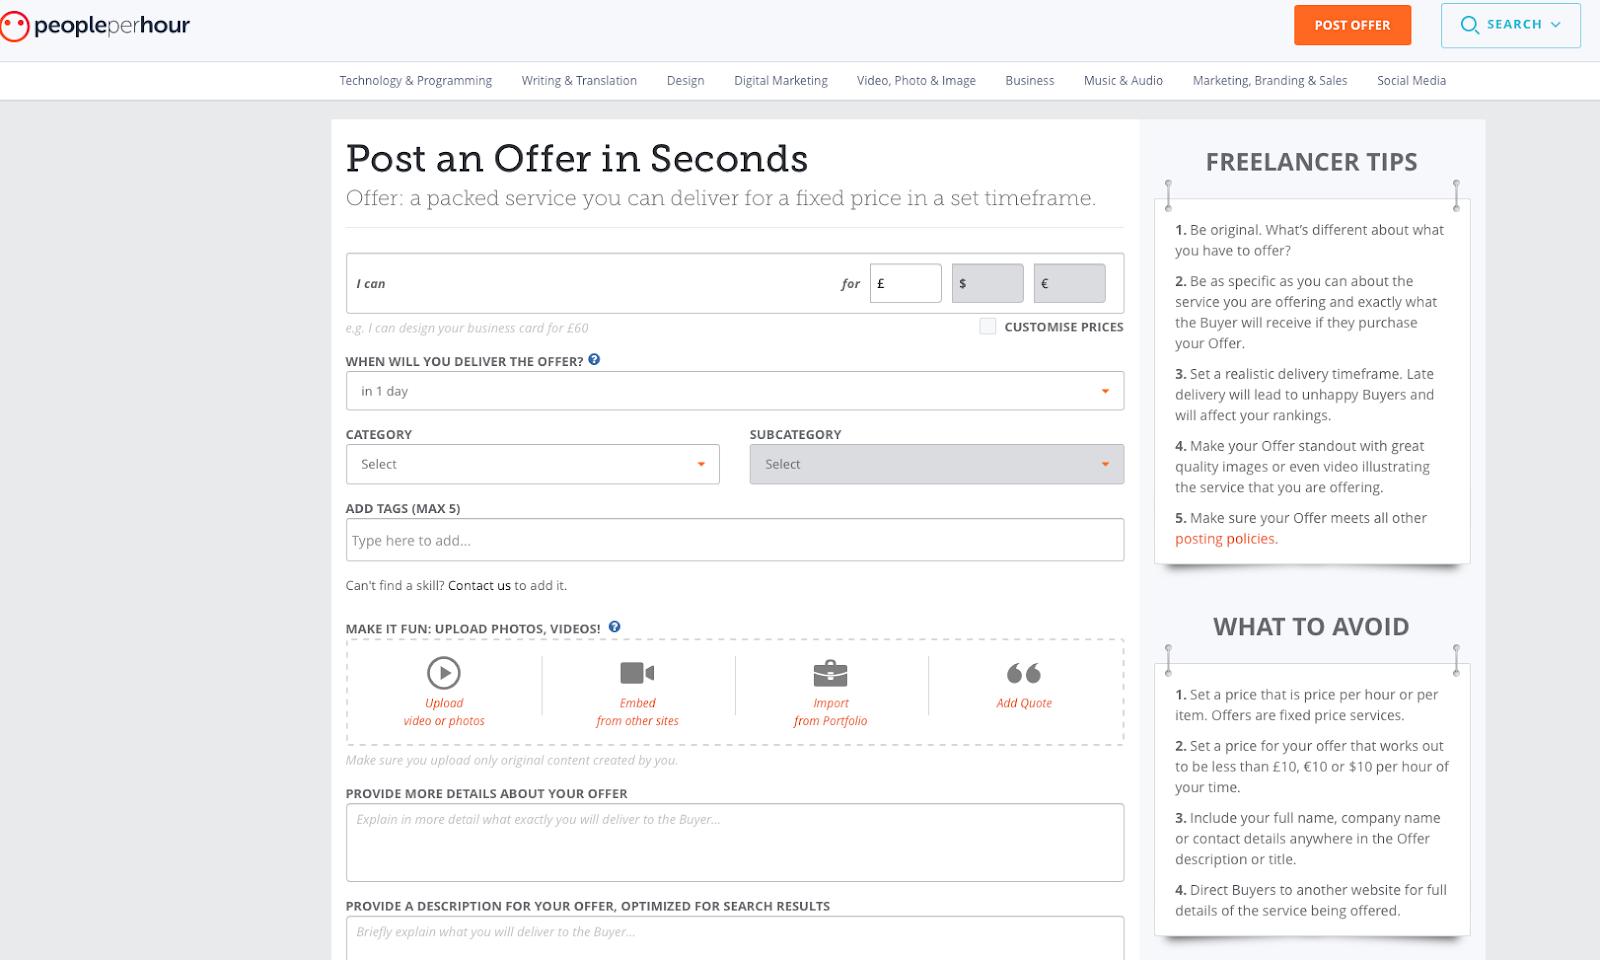 Screenshot of Offer form on PeoplePerHour